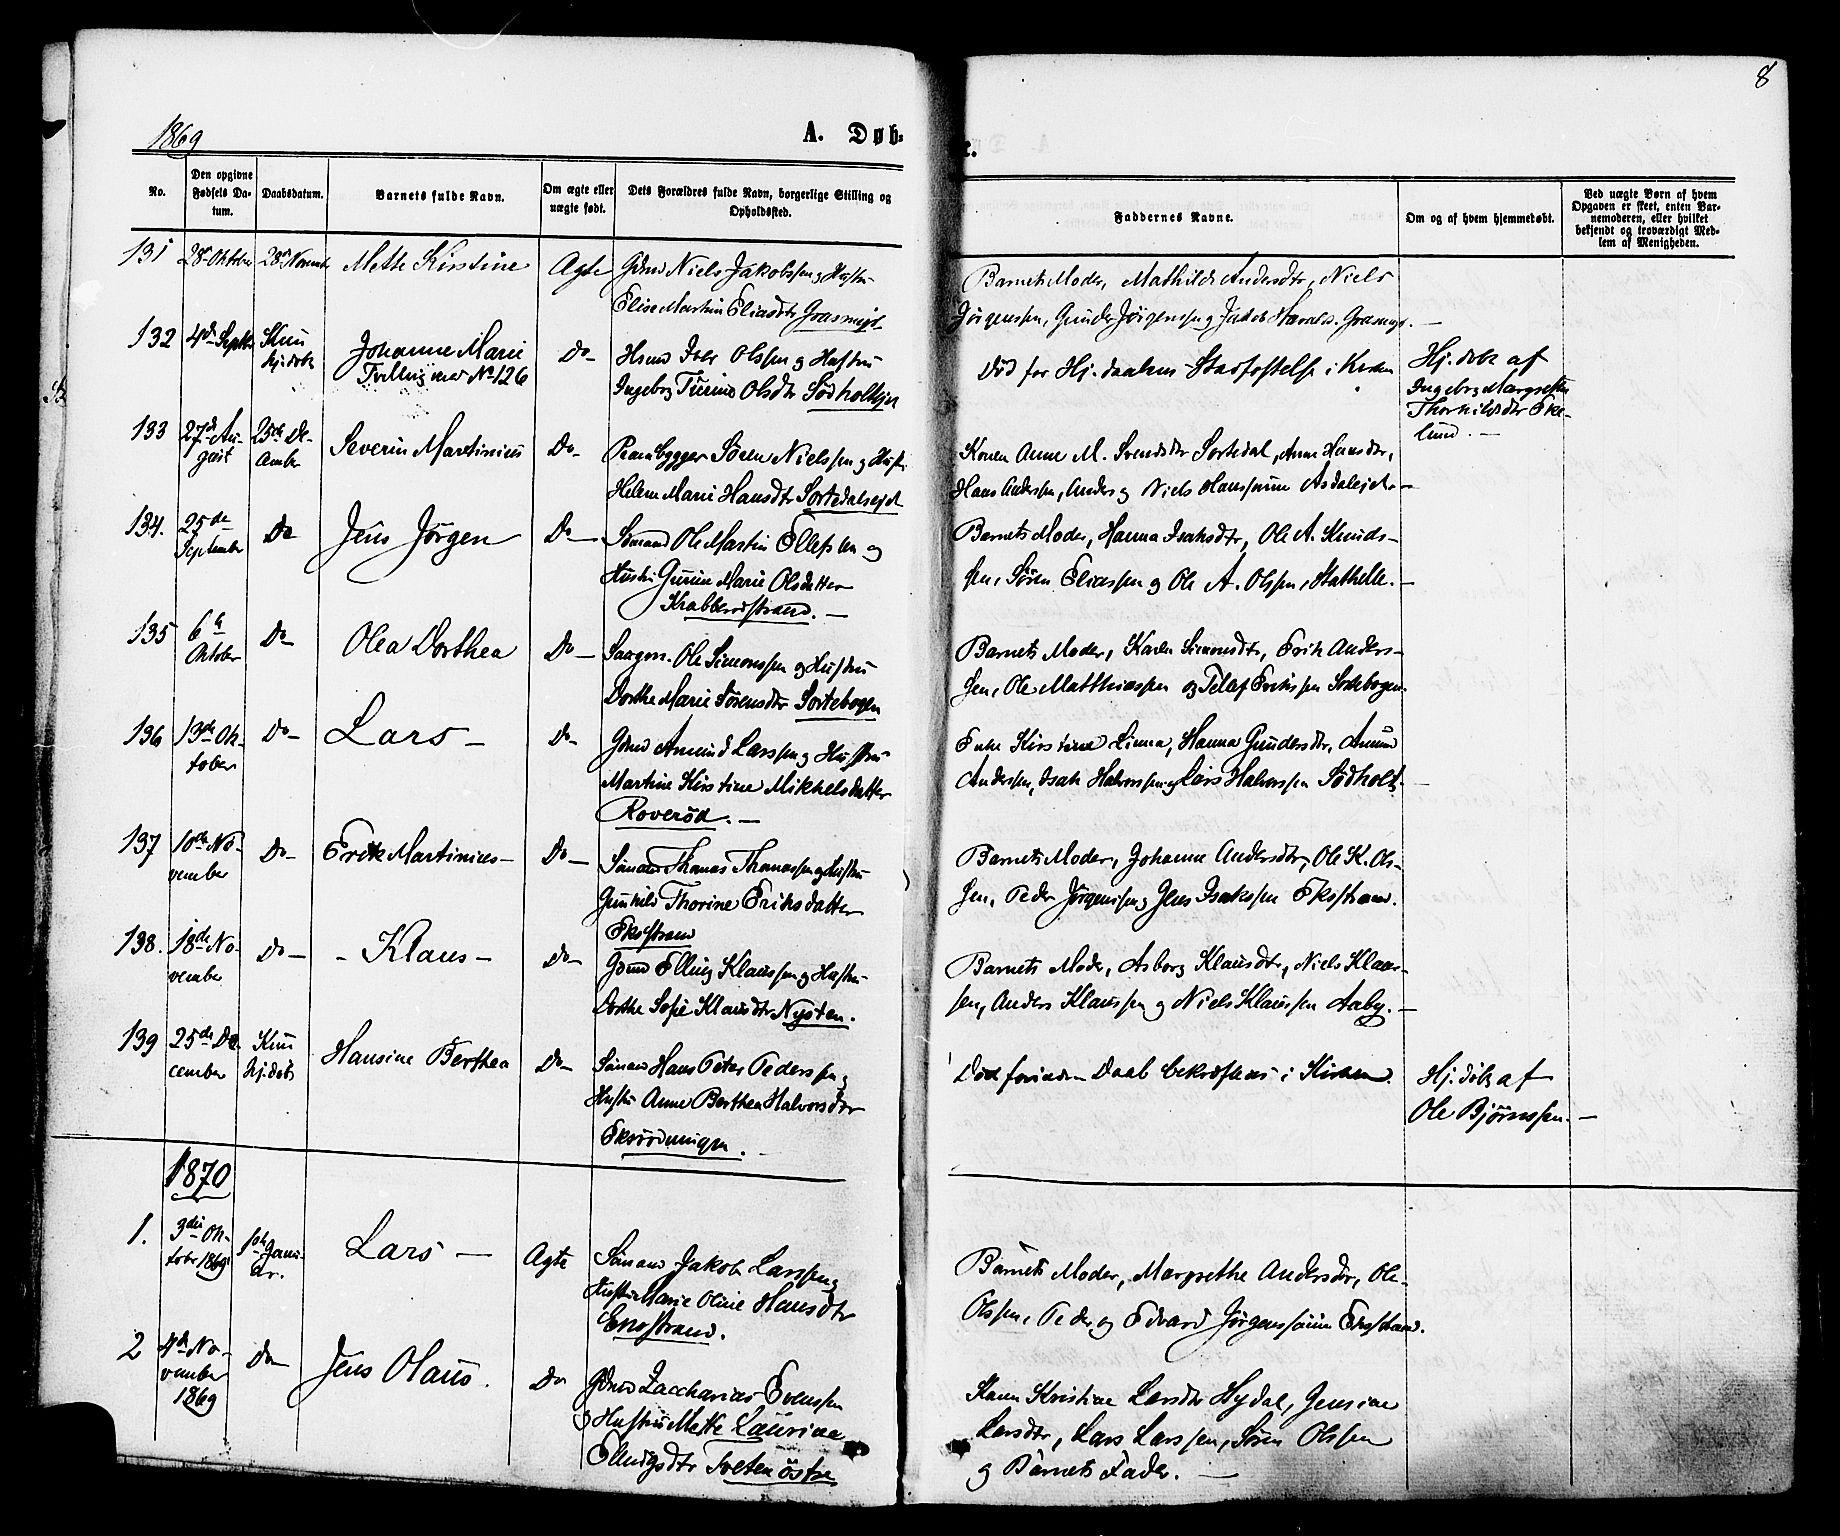 SAKO, Bamble kirkebøker, F/Fa/L0006: Ministerialbok nr. I 6, 1869-1877, s. 8